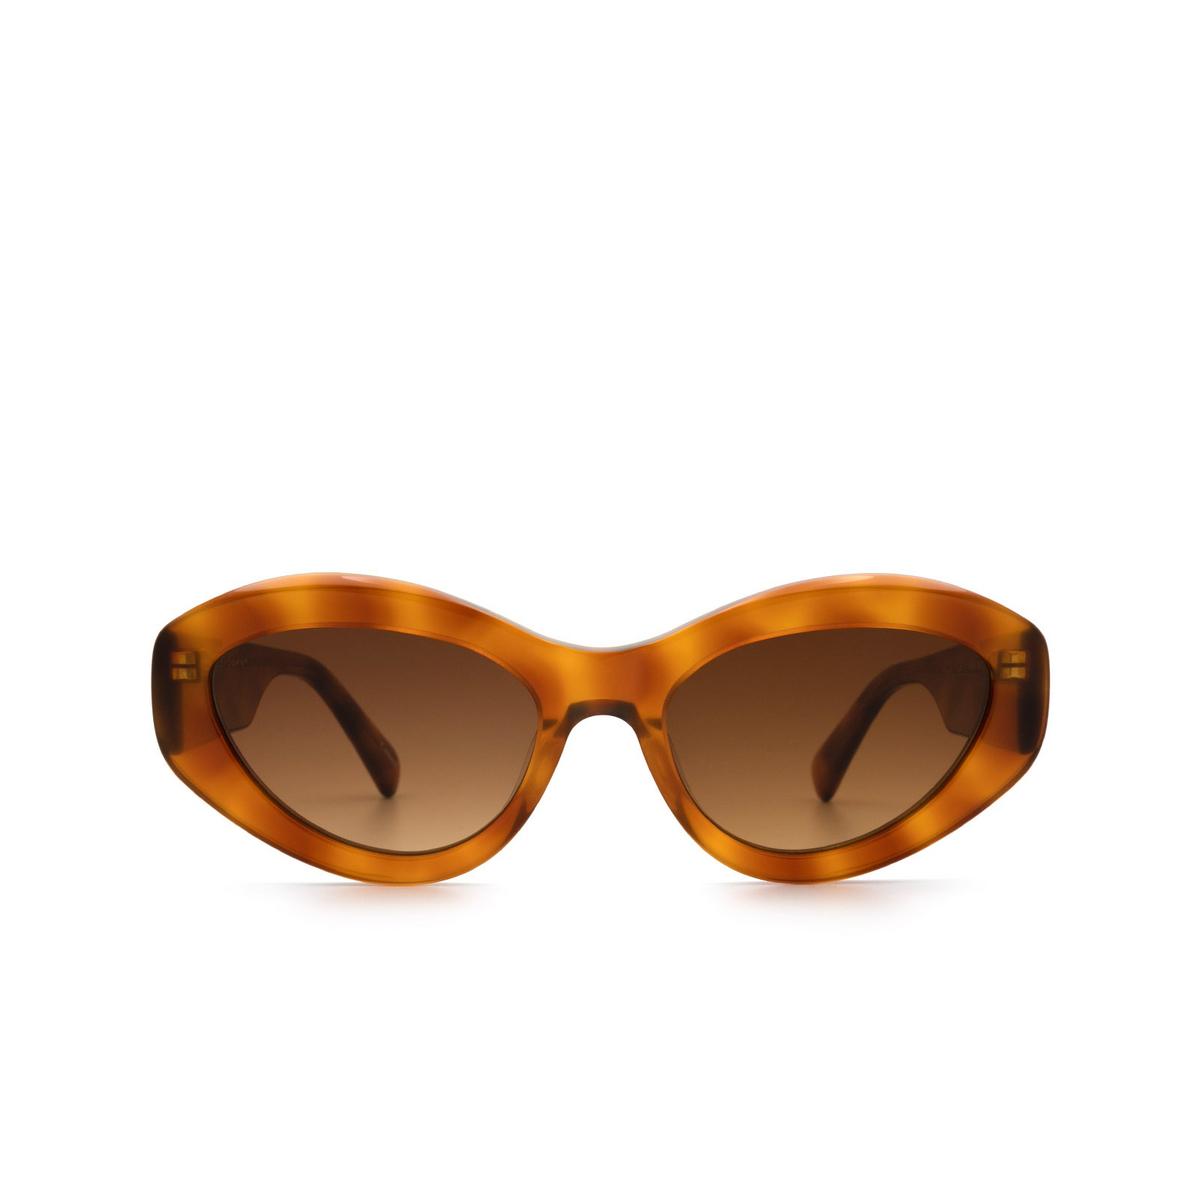 Chimi® Cat-eye Sunglasses: 09 color Havana.